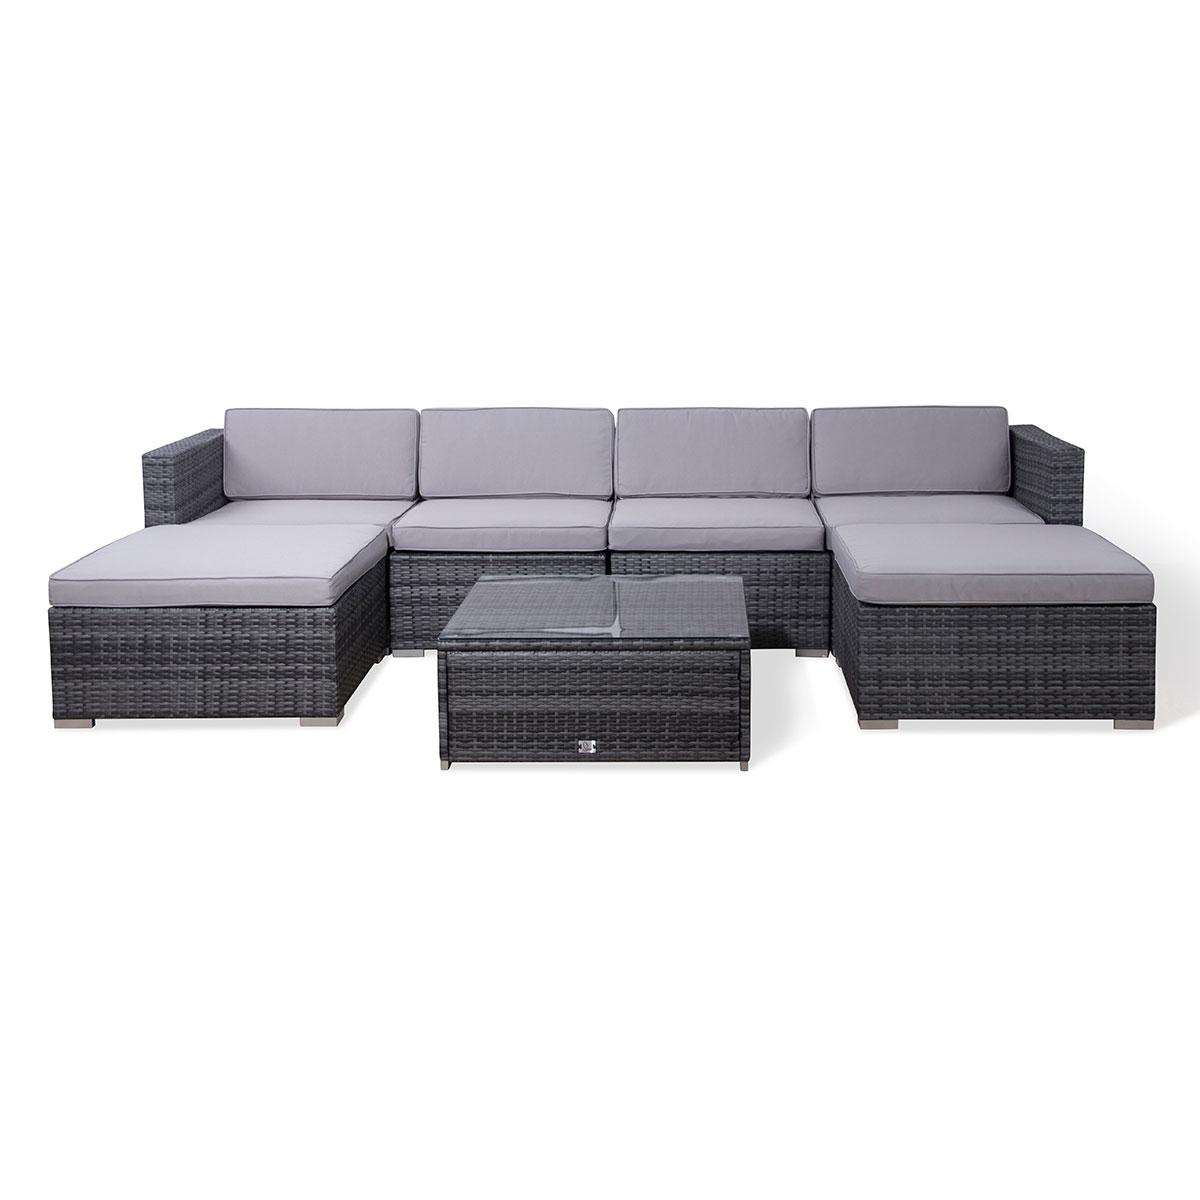 90946 SVITA LUGANO Poly Rattan Lounge XXL grau